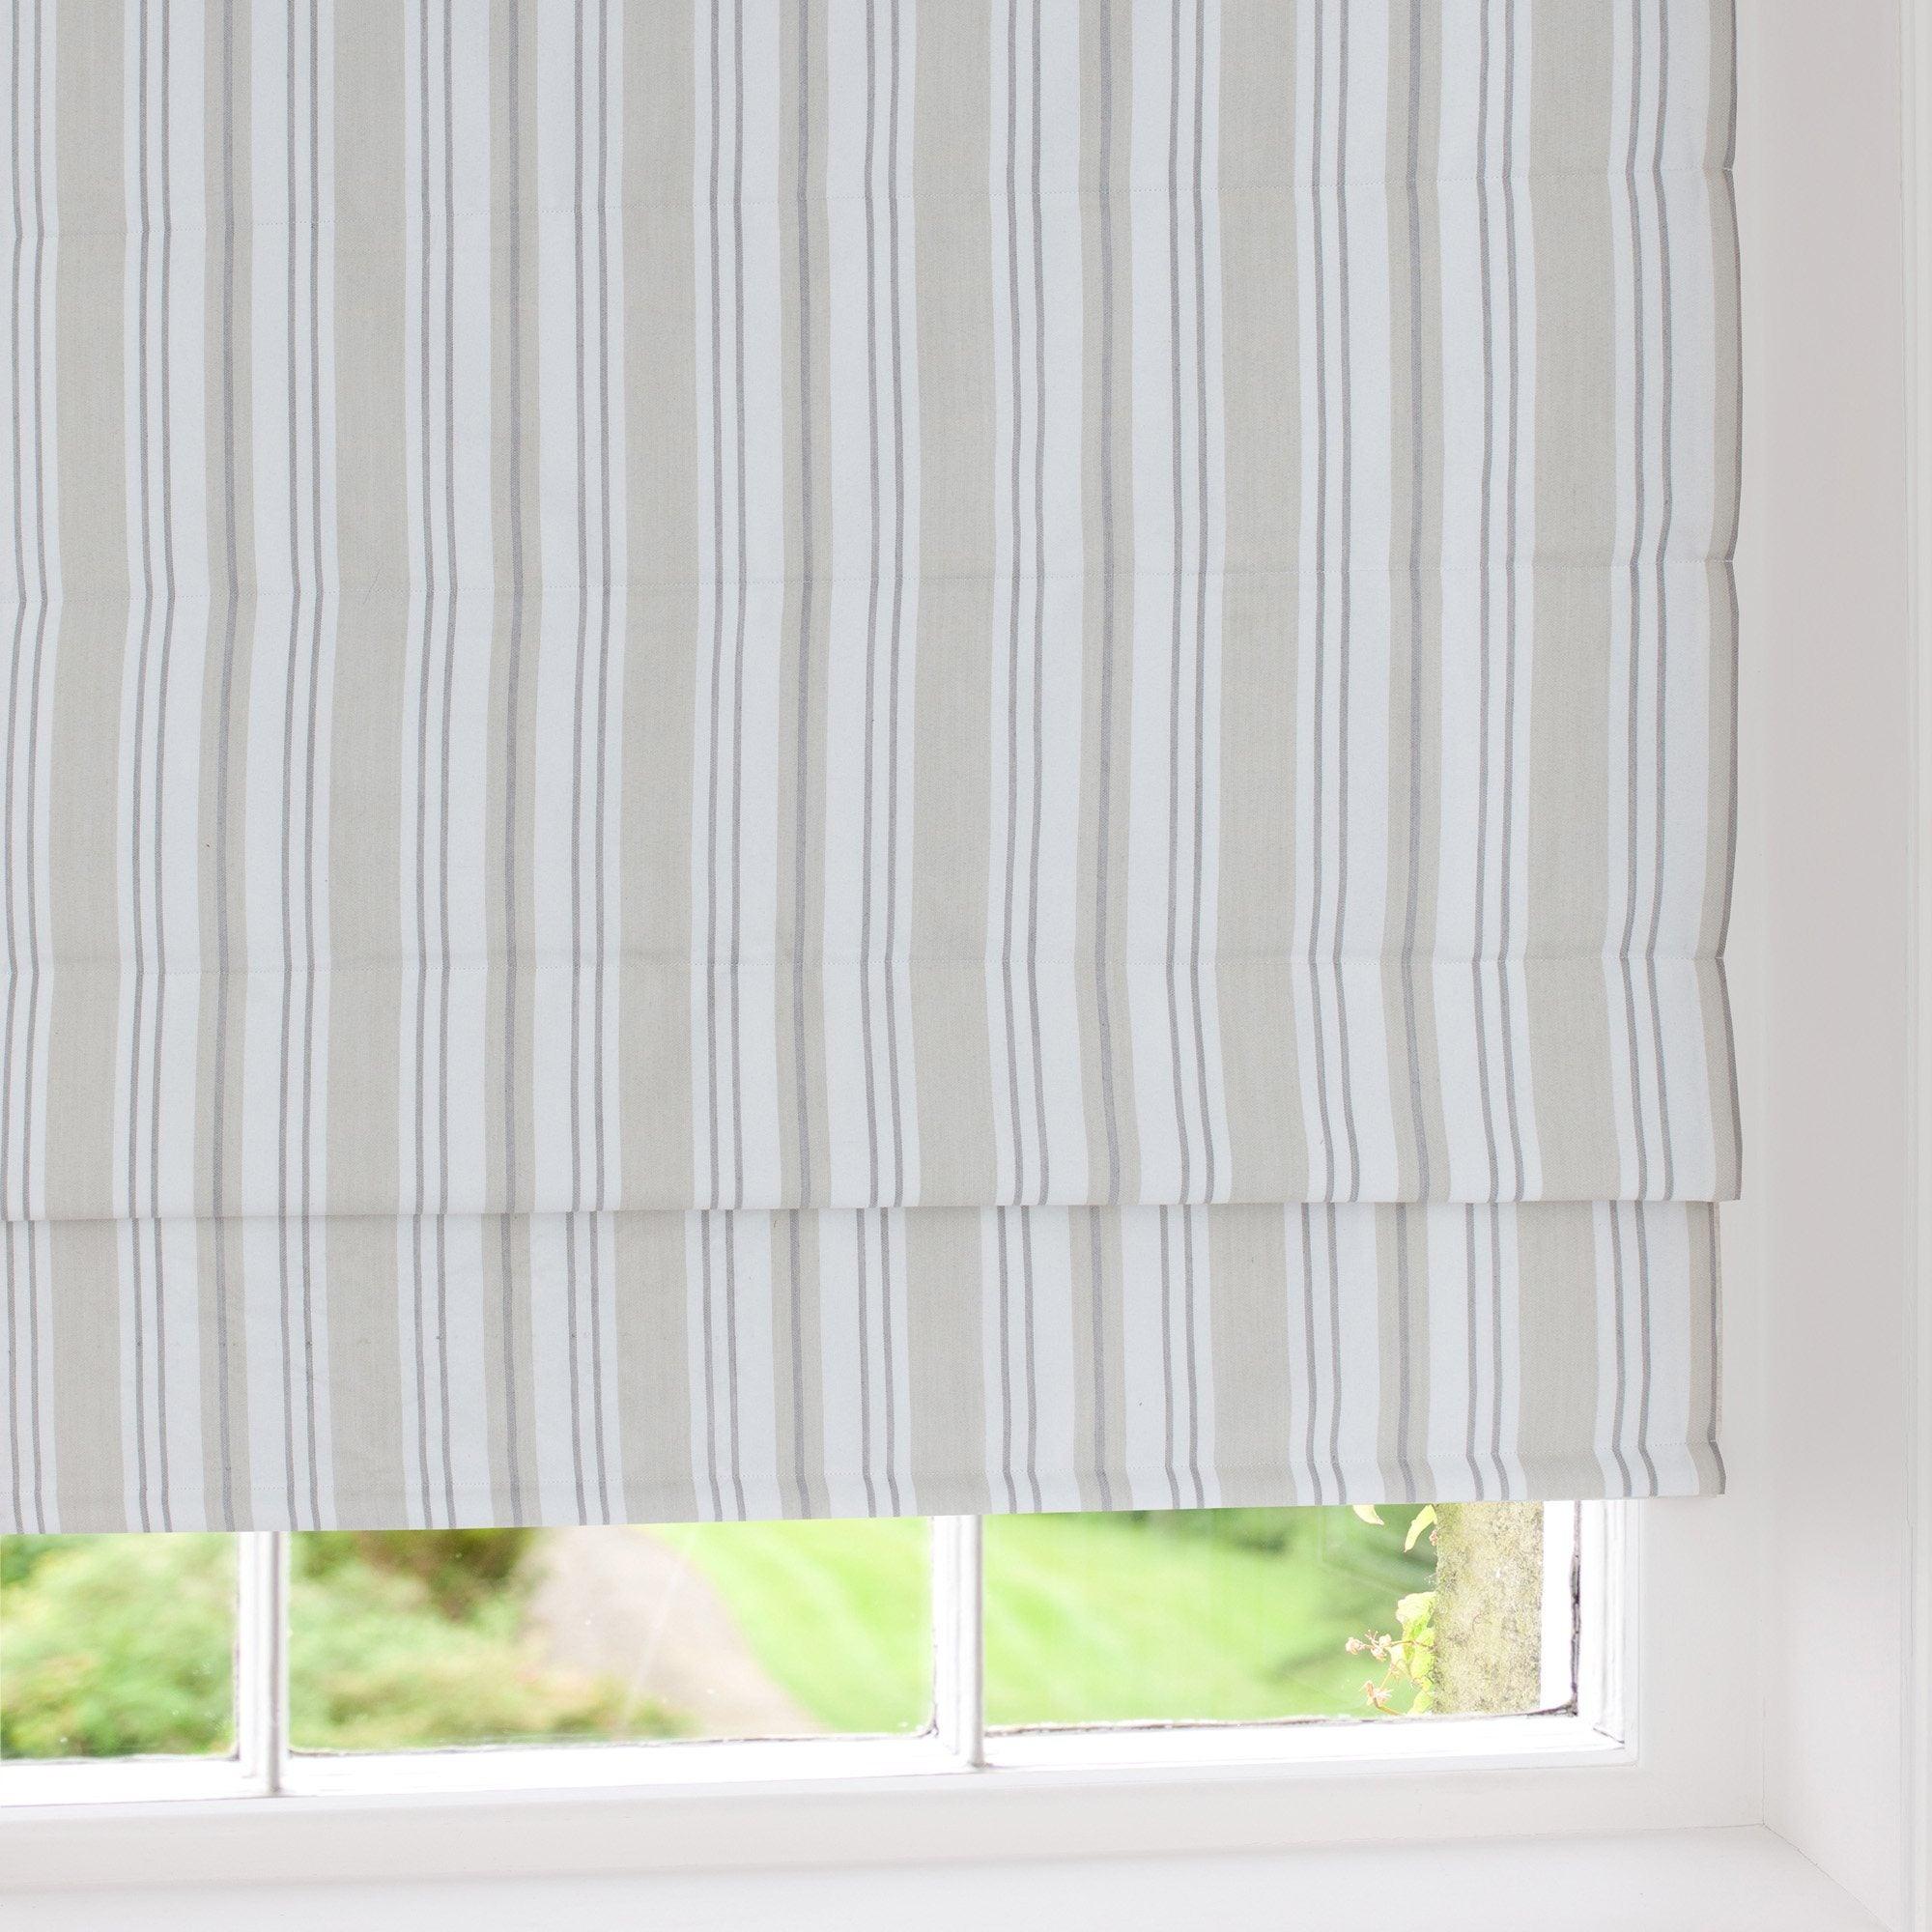 new haven blackout roman blinds dunelm. Black Bedroom Furniture Sets. Home Design Ideas